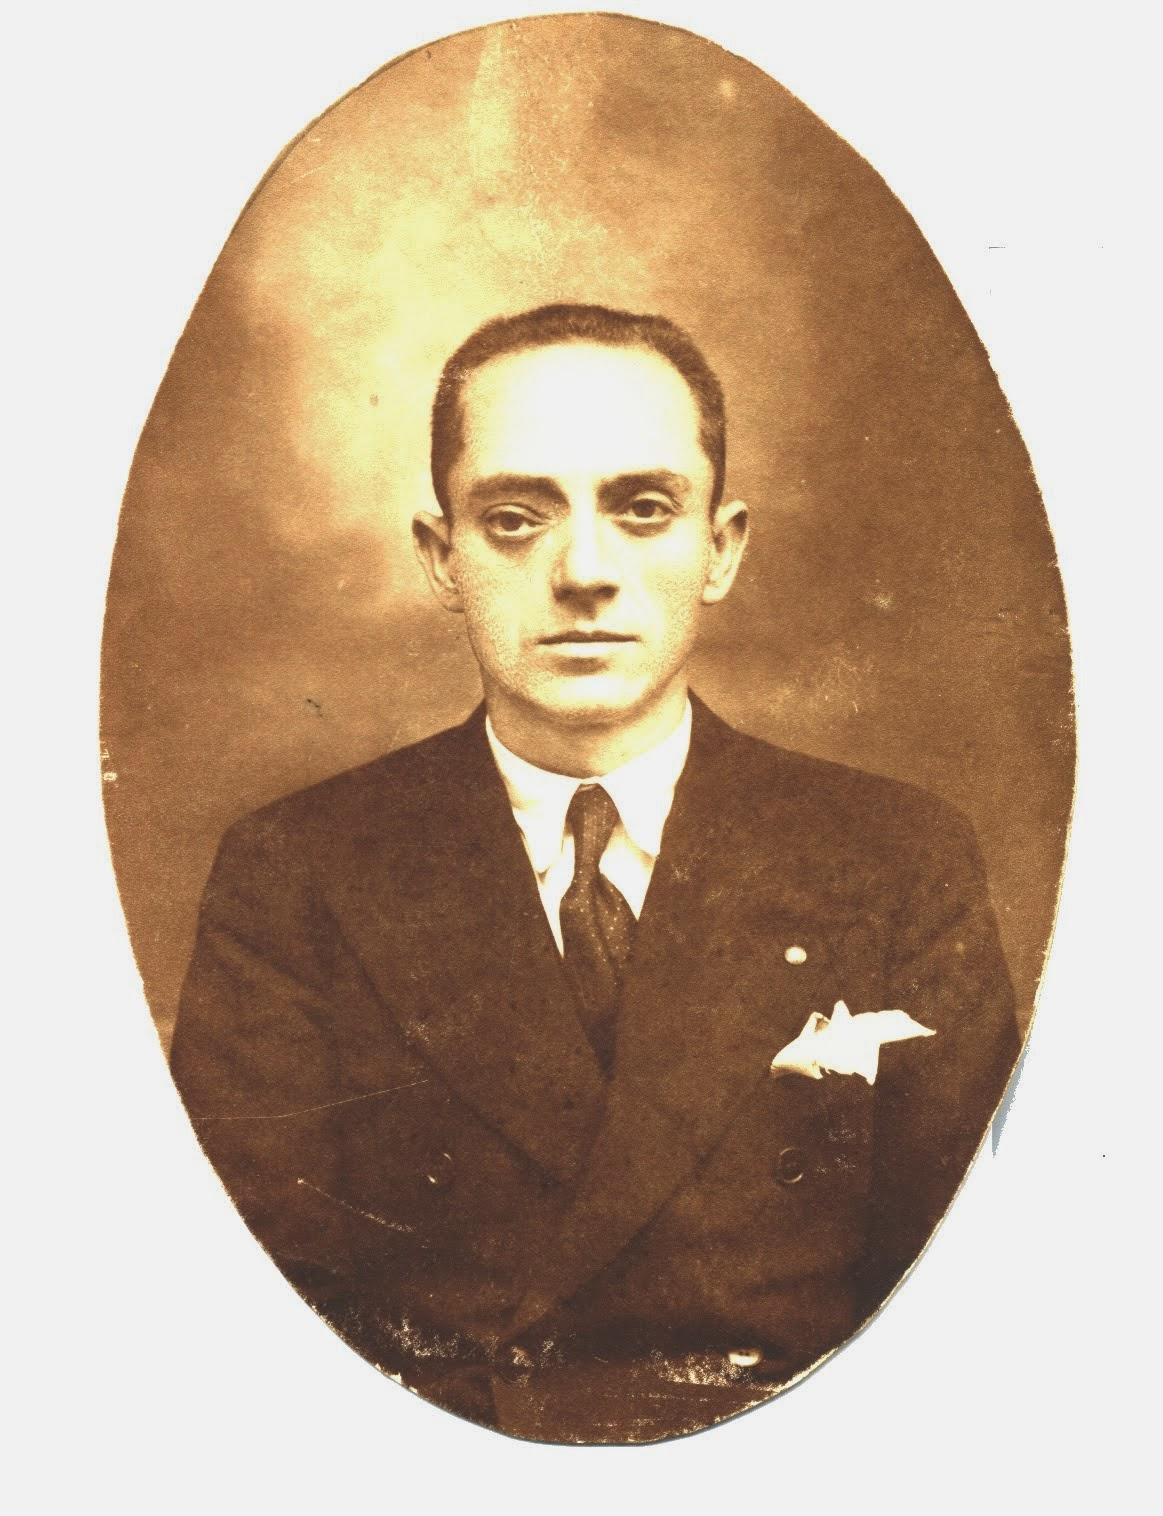 Homenaje a José González Barrero